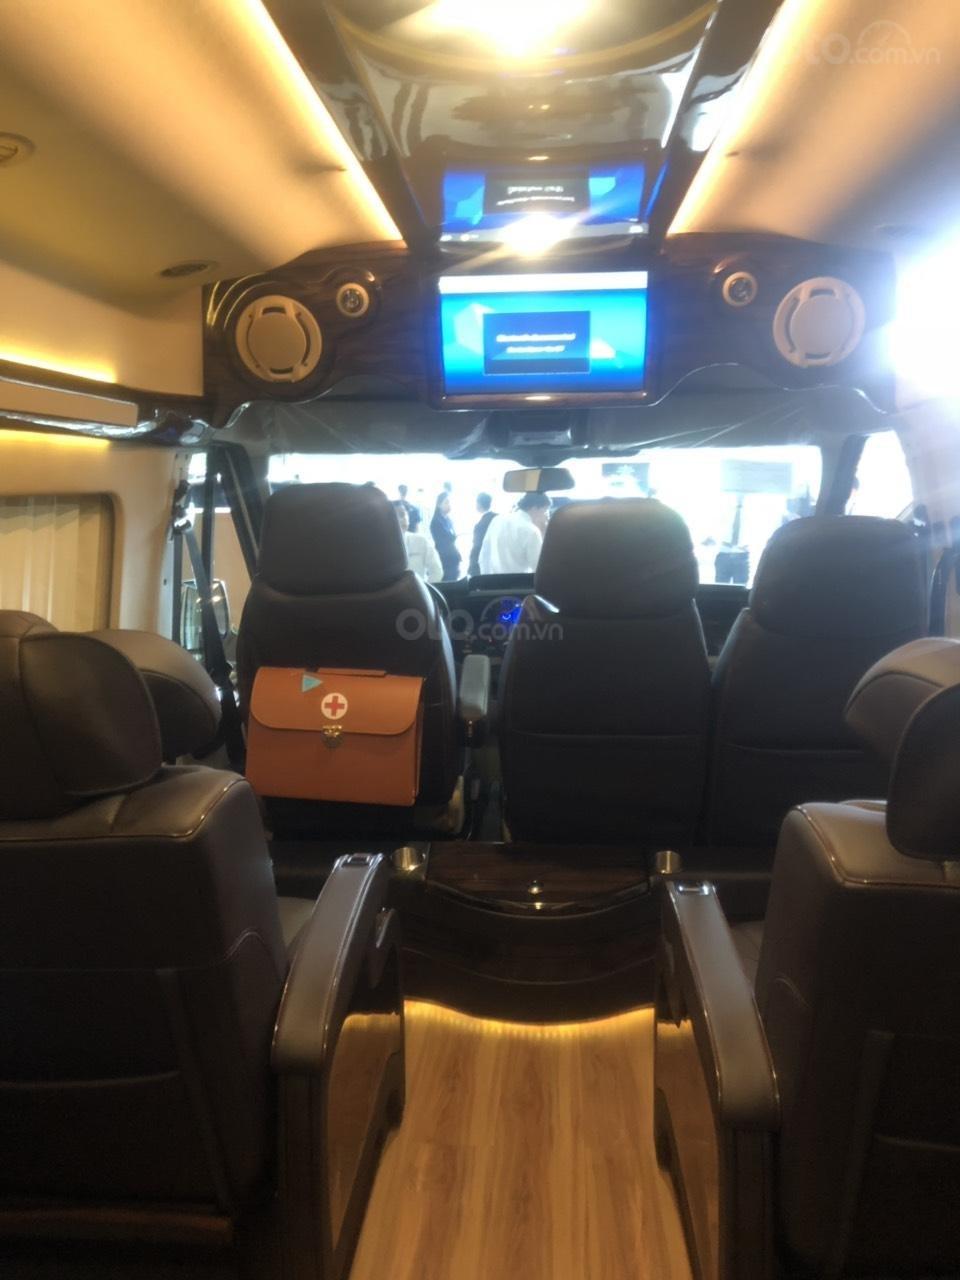 Transit Limousine 10 chỗ 2019 (10)